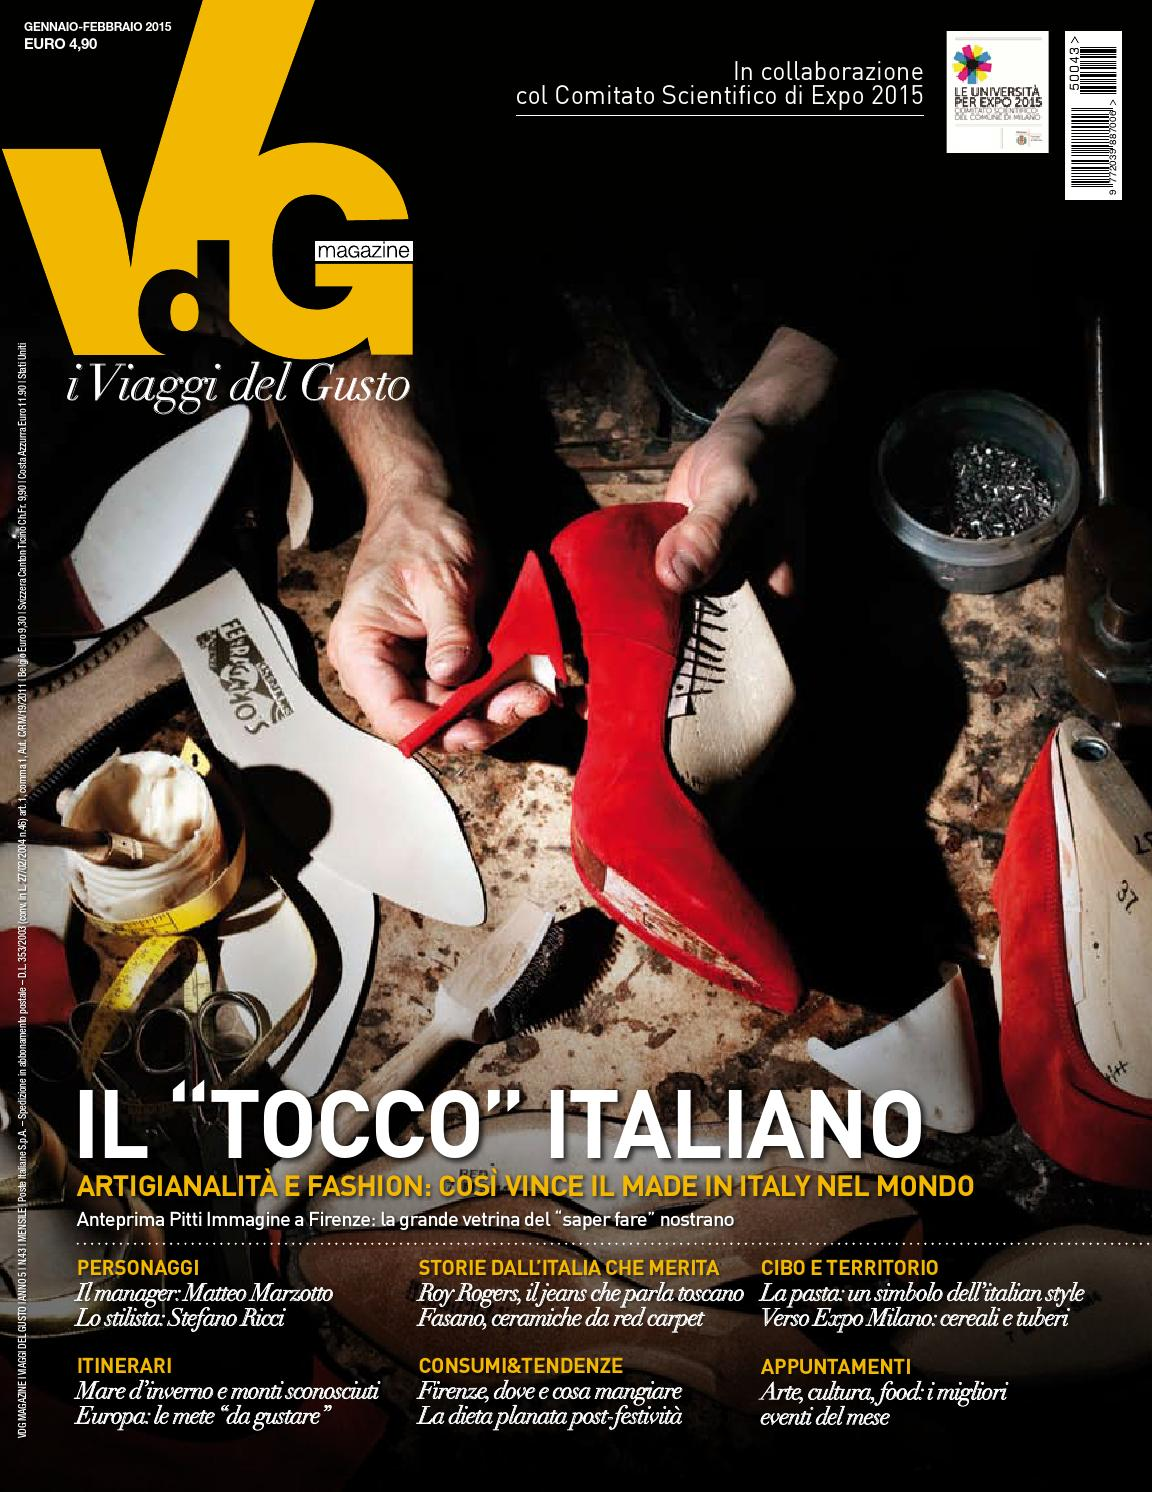 VdG i Viaggi del Gusto - Gennaio Febbraio 2015 by vdgmagazine - issuu 194790e996e5